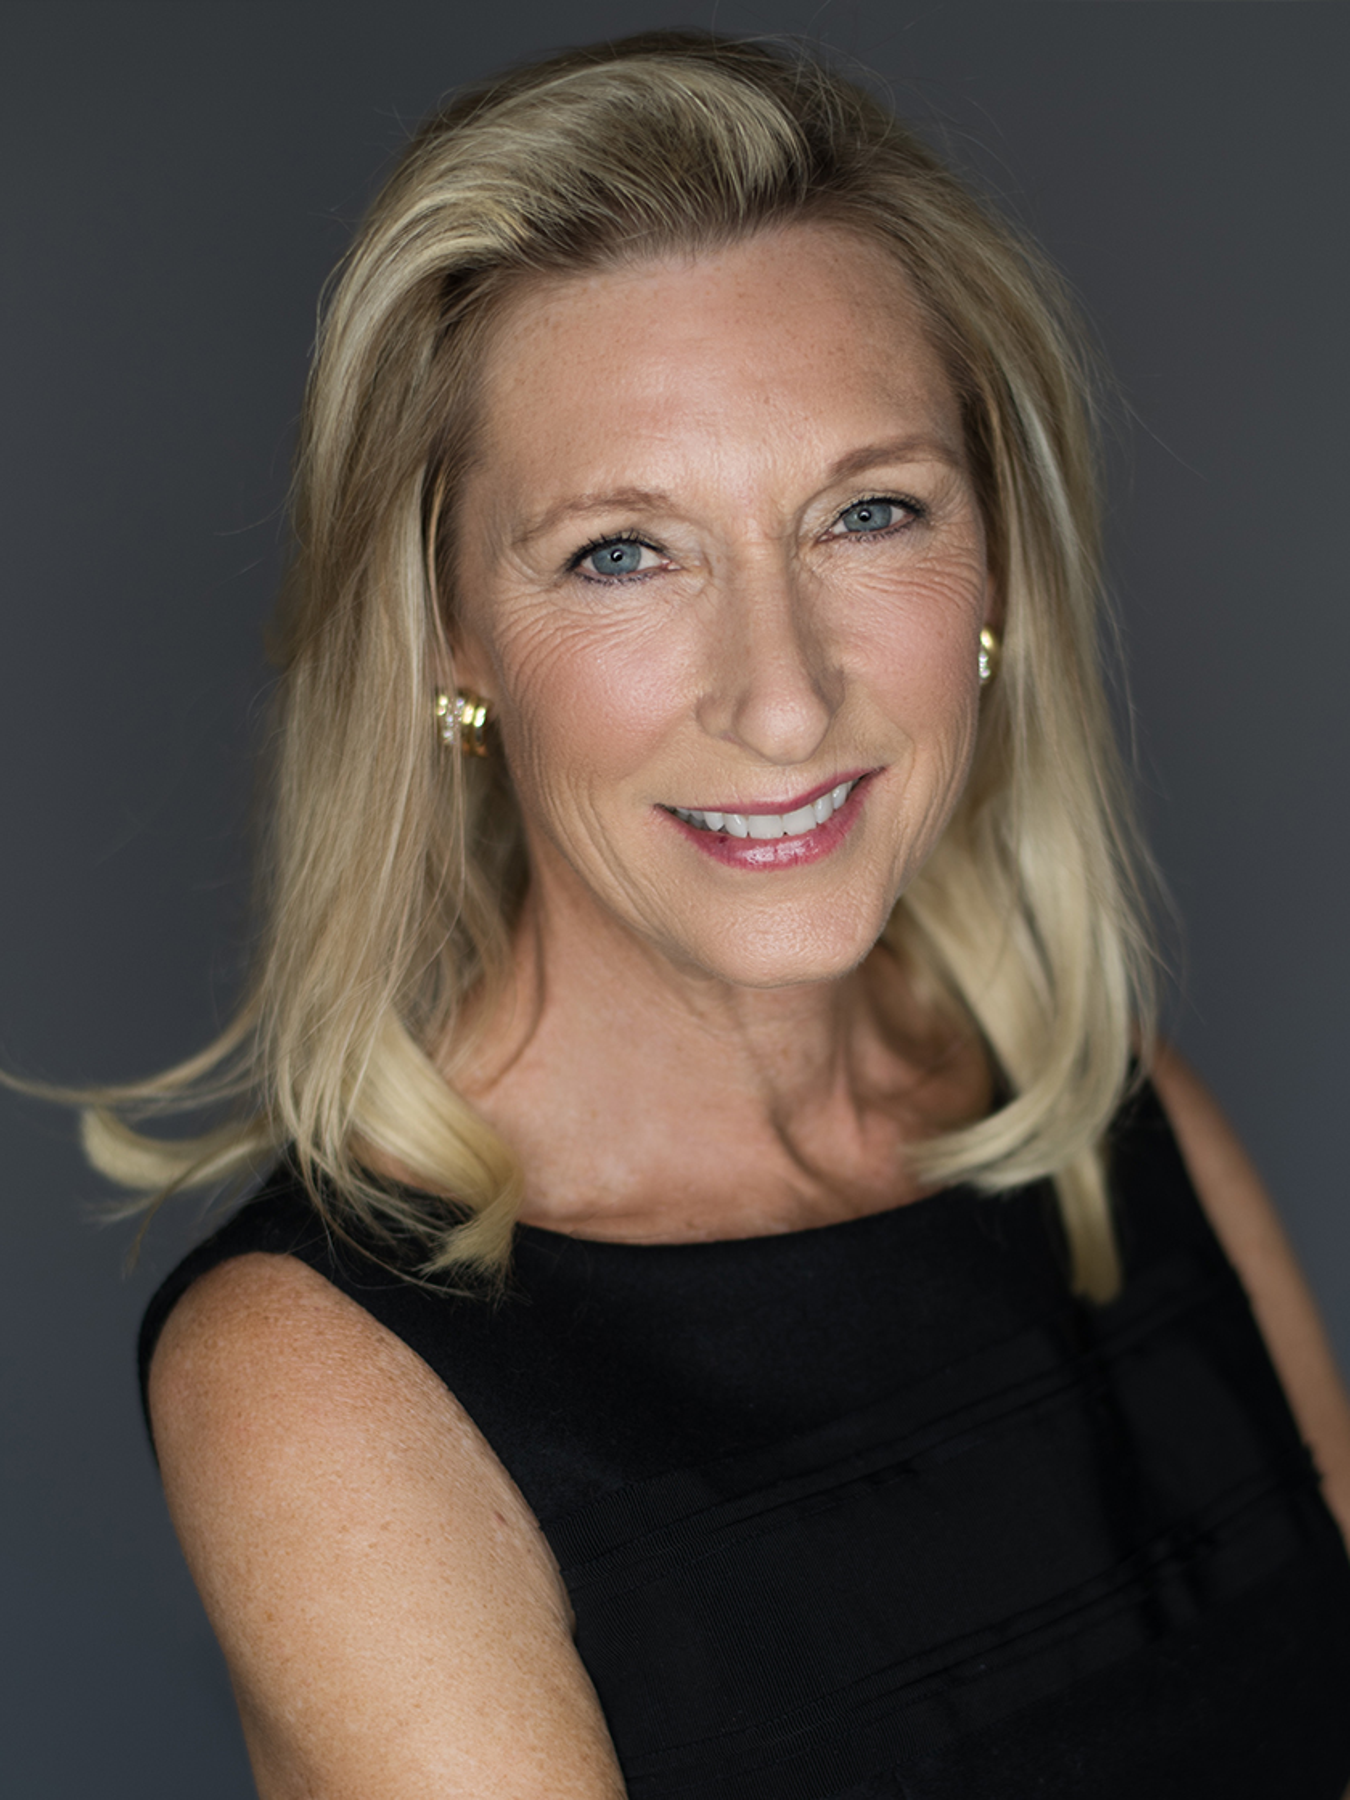 Kristine Blake